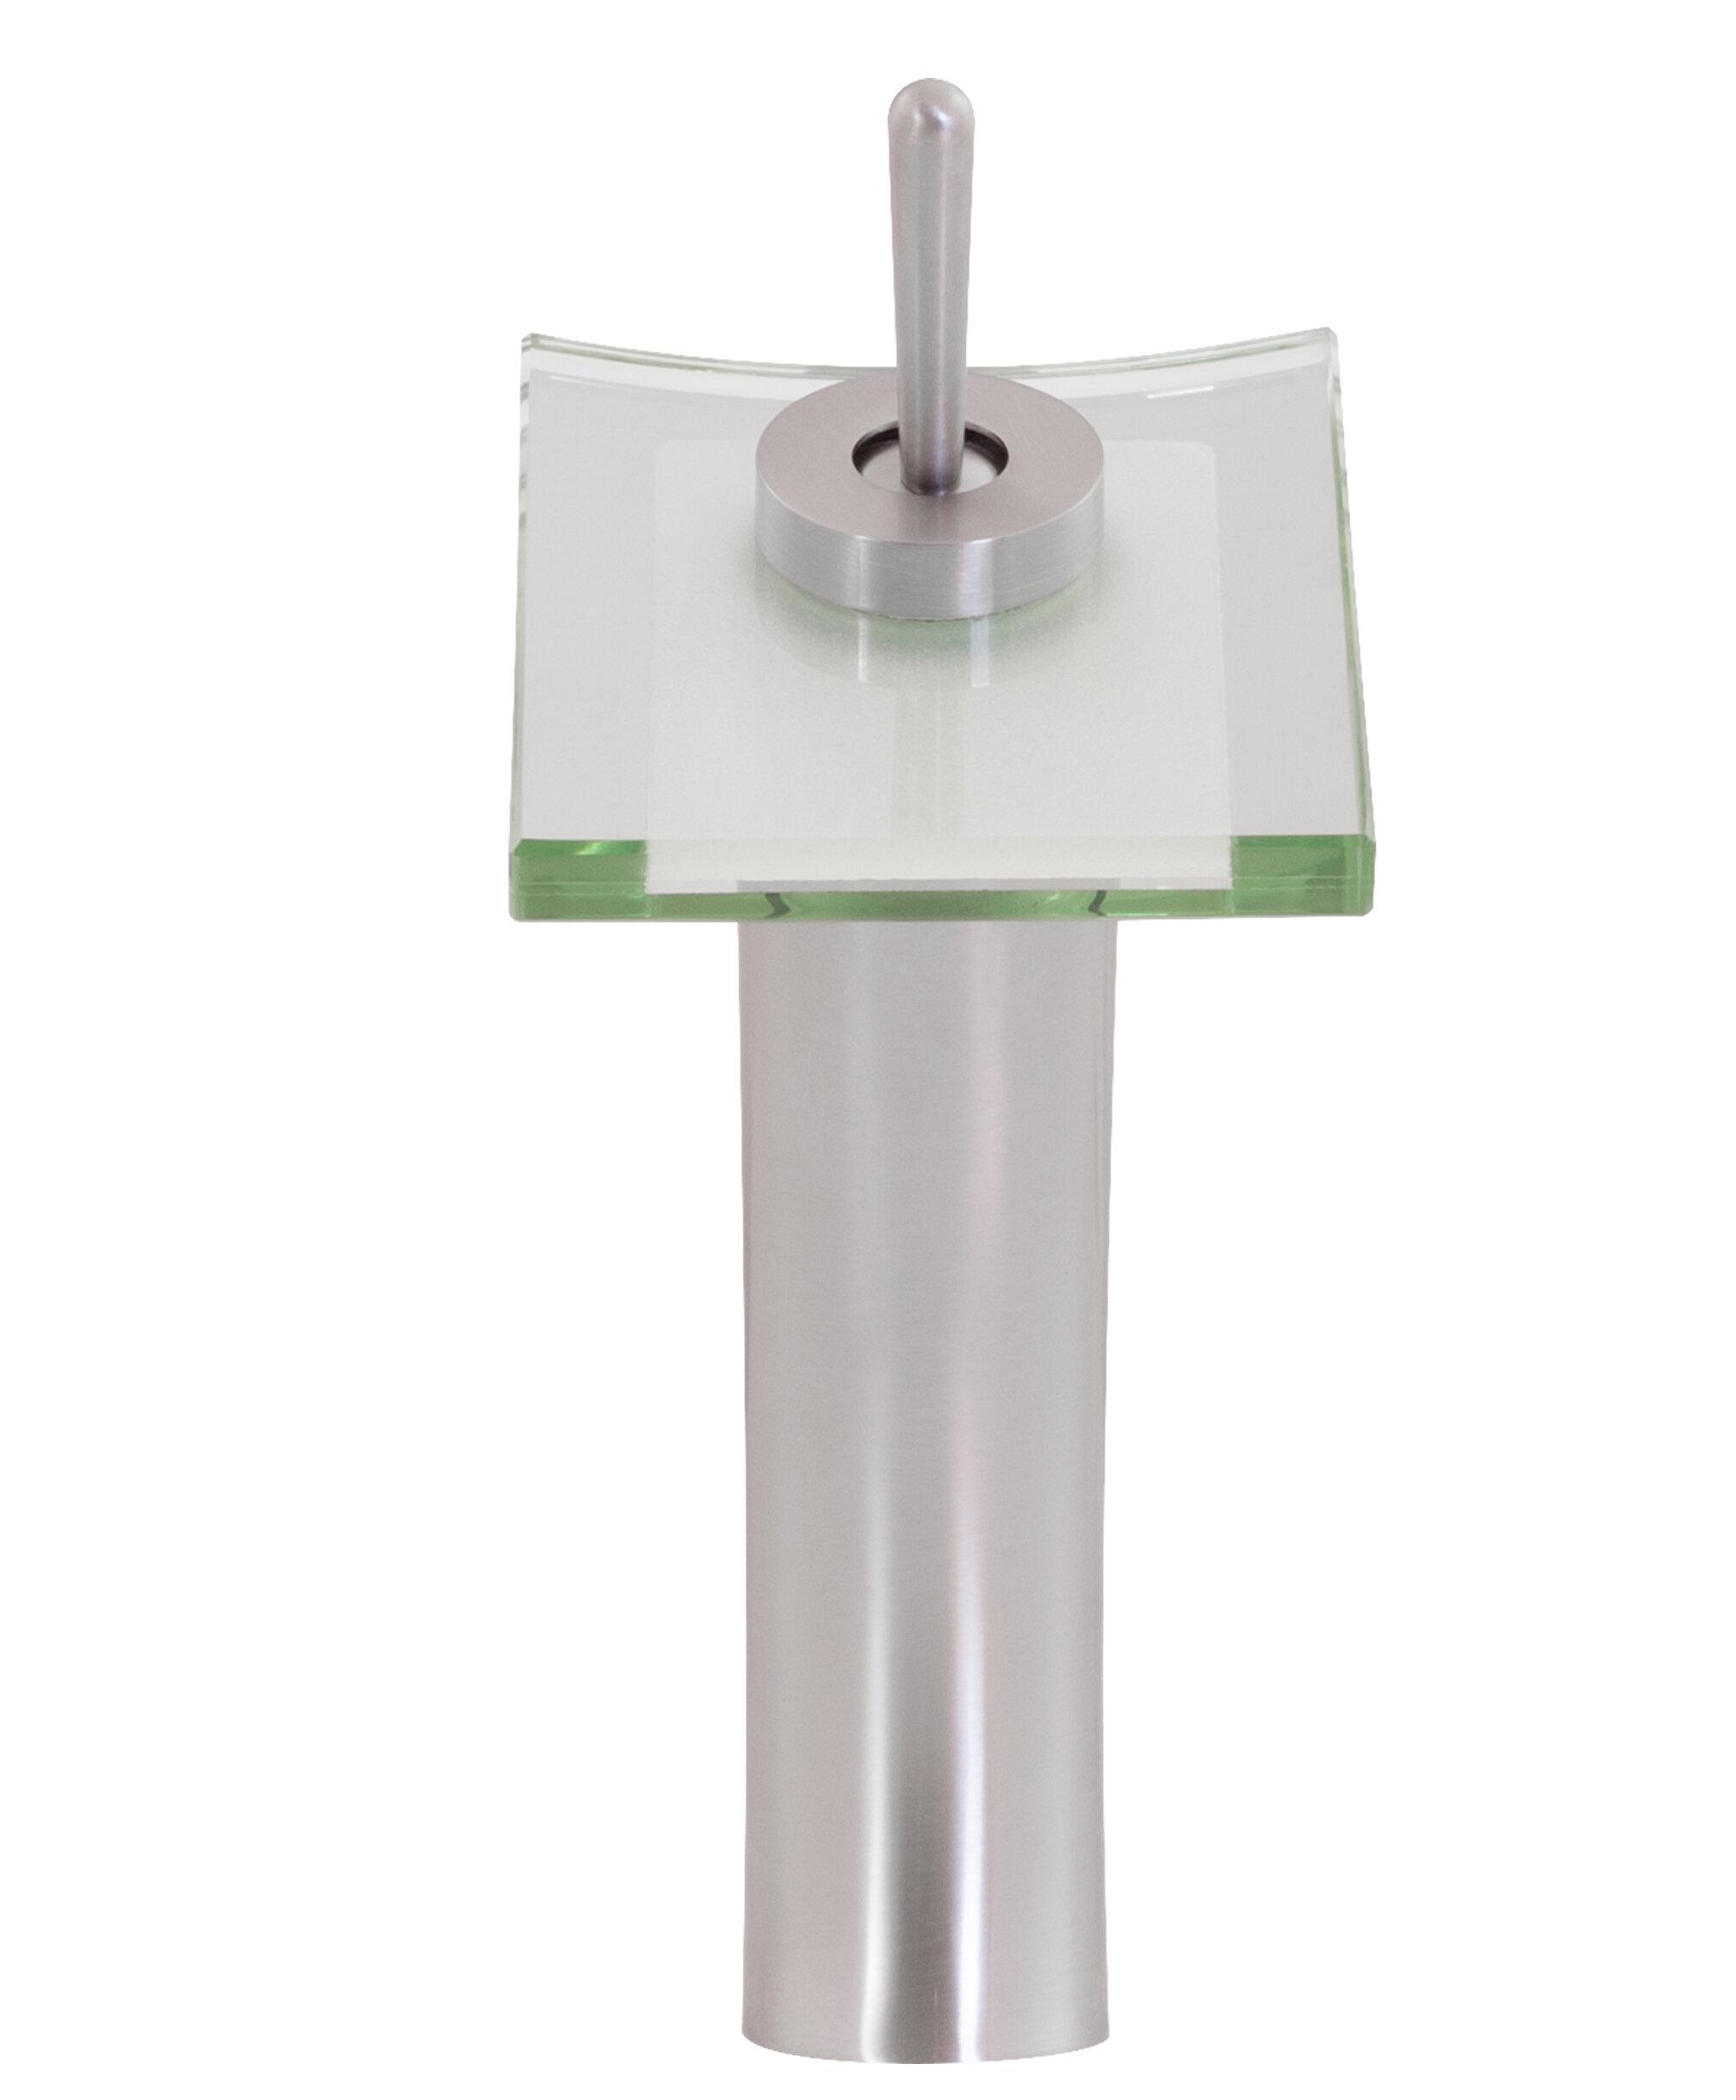 Topia Single Lever Vessel Sink Bathroom Faucet Reviews Wayfair